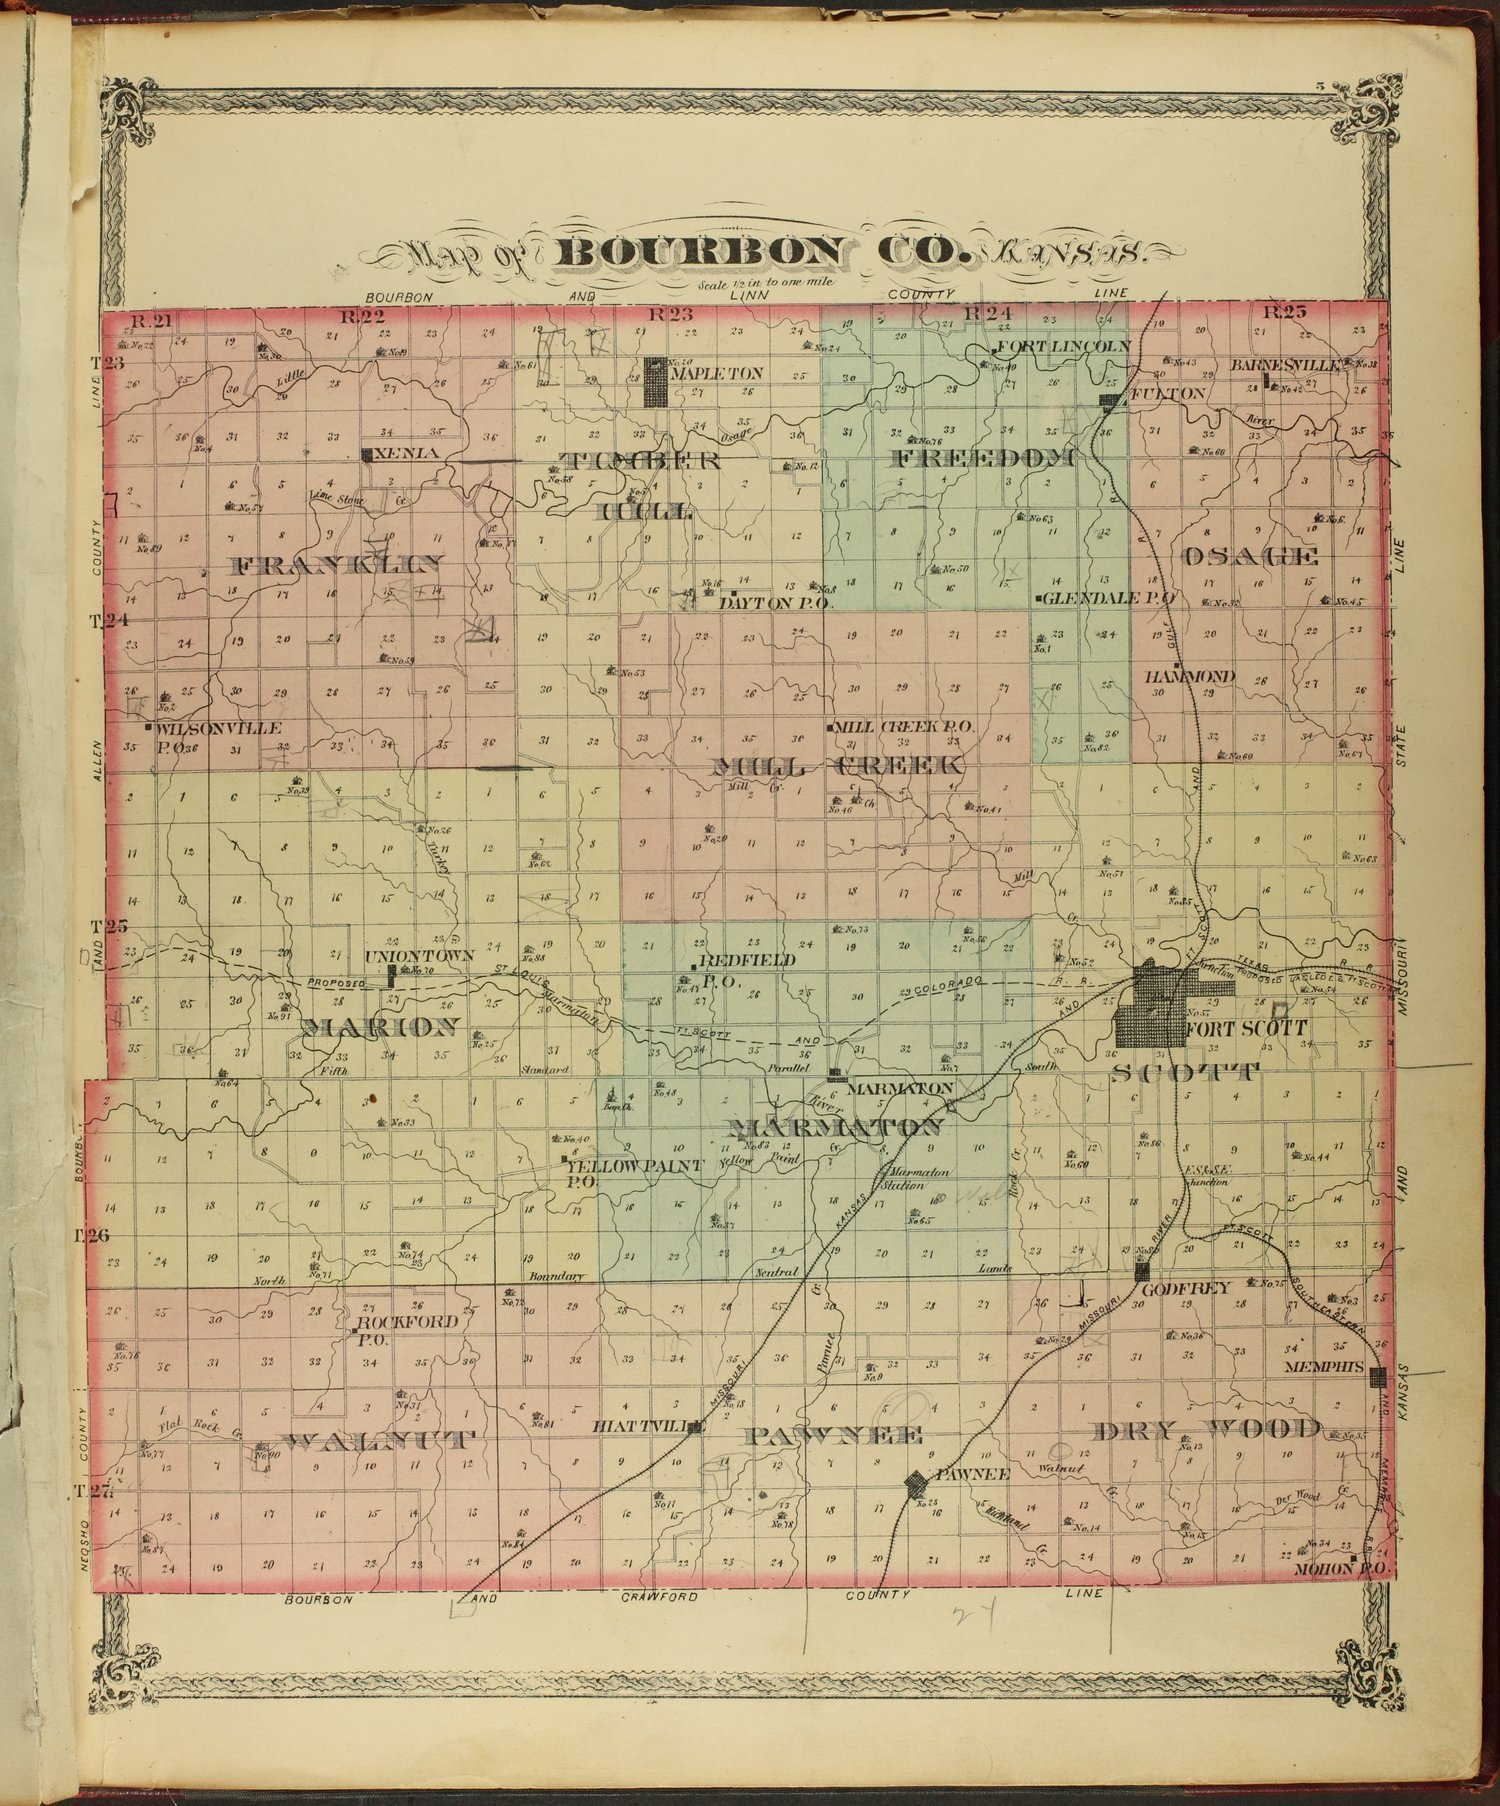 An illustrated historical atlas of Bourbon County, Kansas - 5